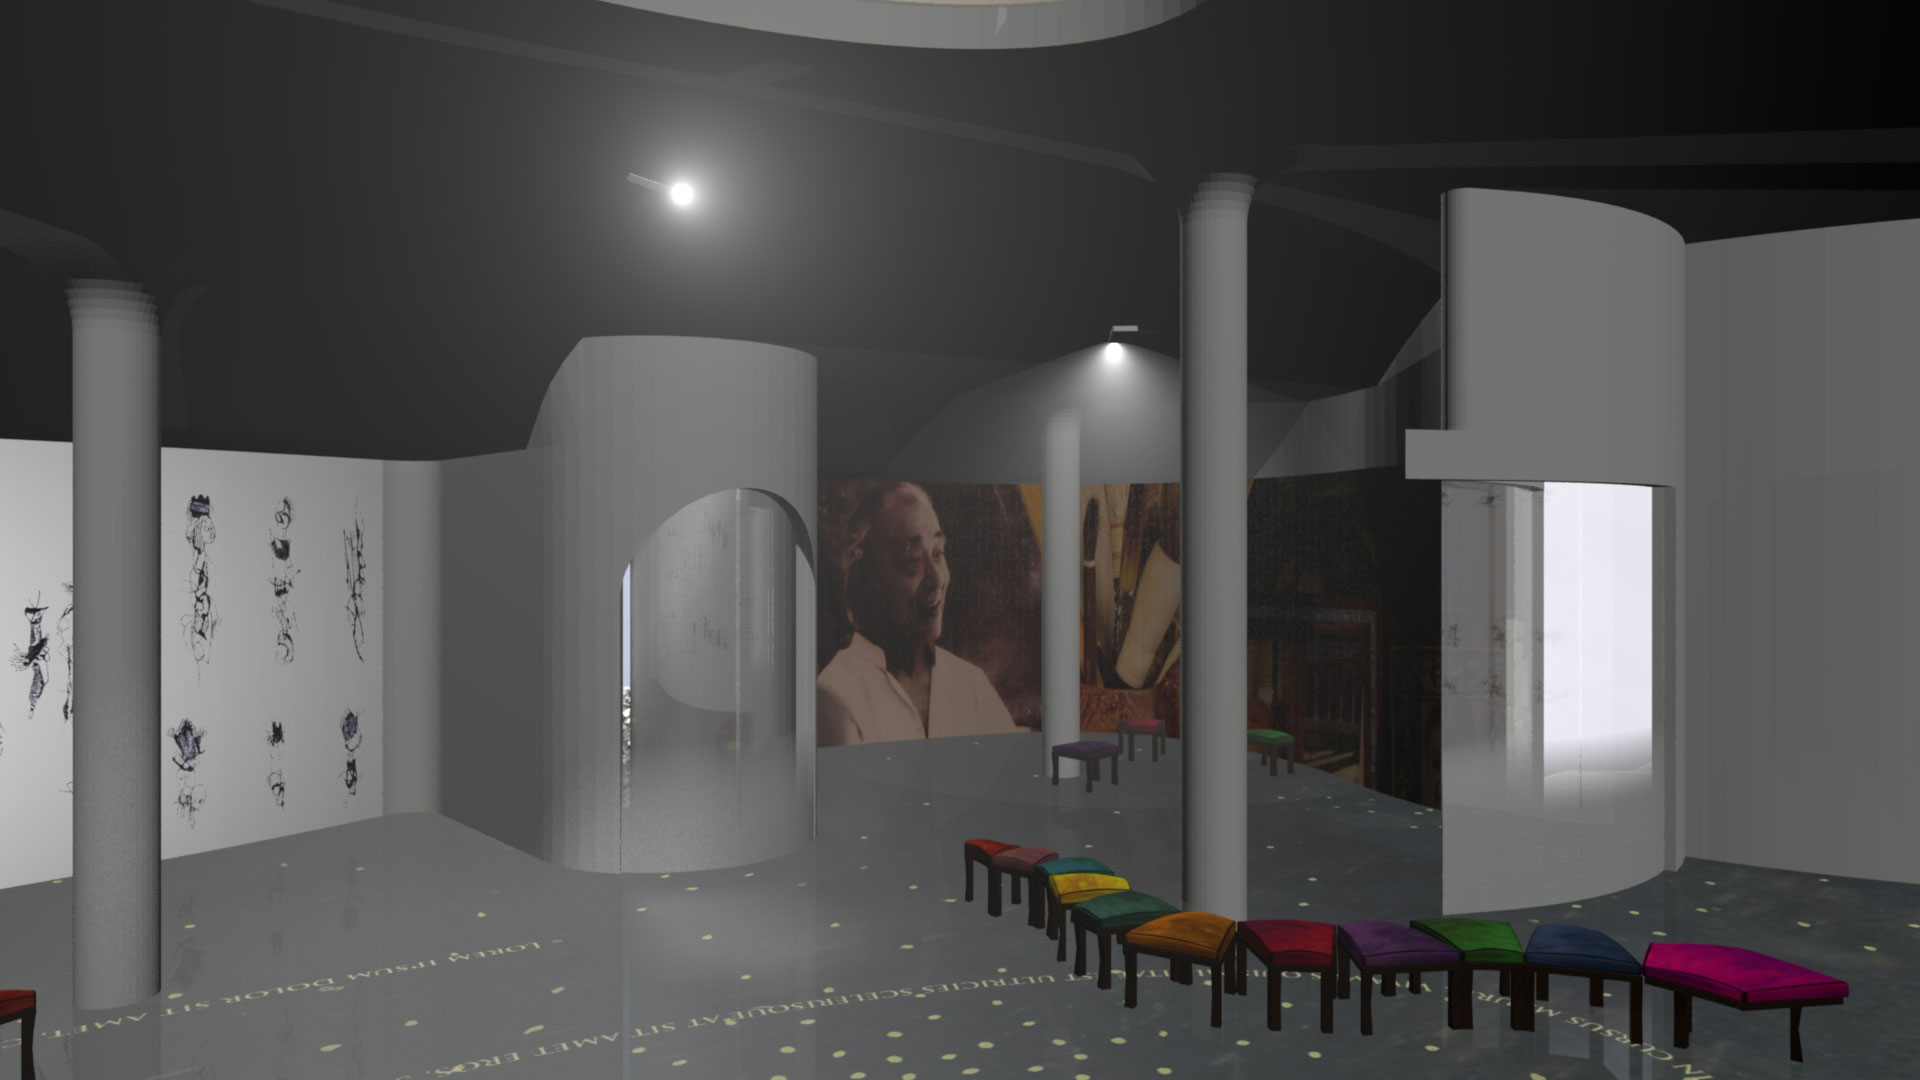 Lebadang-interieur-LBDSpace-03-Helene-Mugot-2018